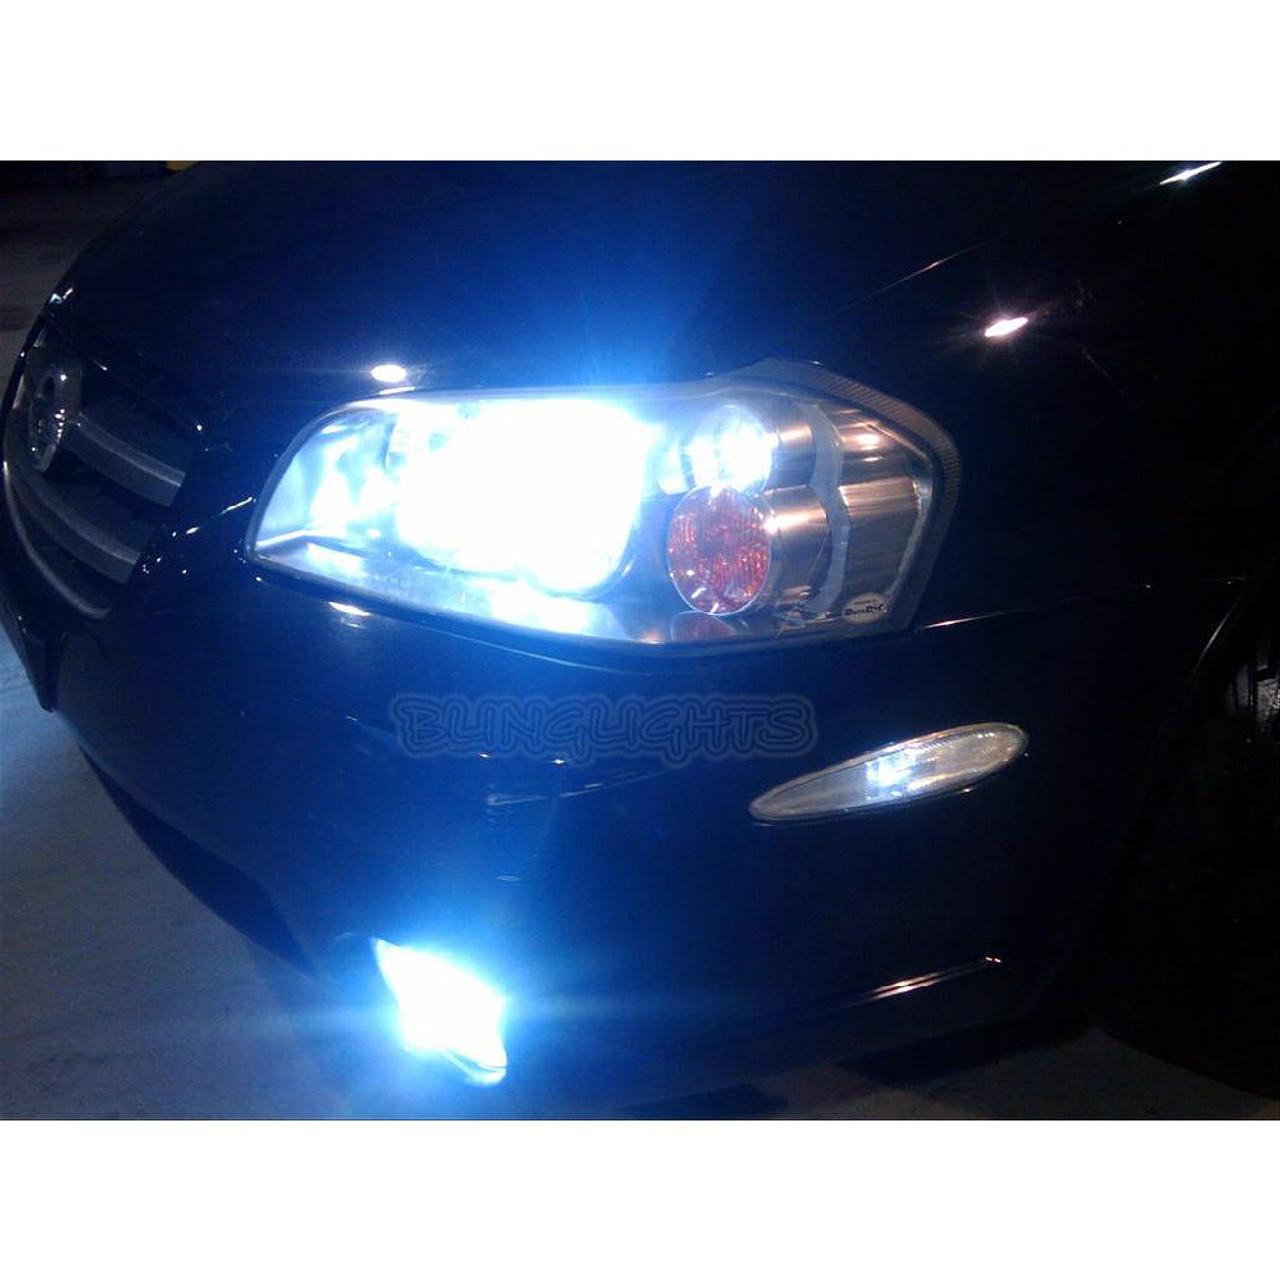 HID Xenon Halogen Light Bulbs Chevy Cavalier 2000 2001 2002 2003 2004 2005-4pcs